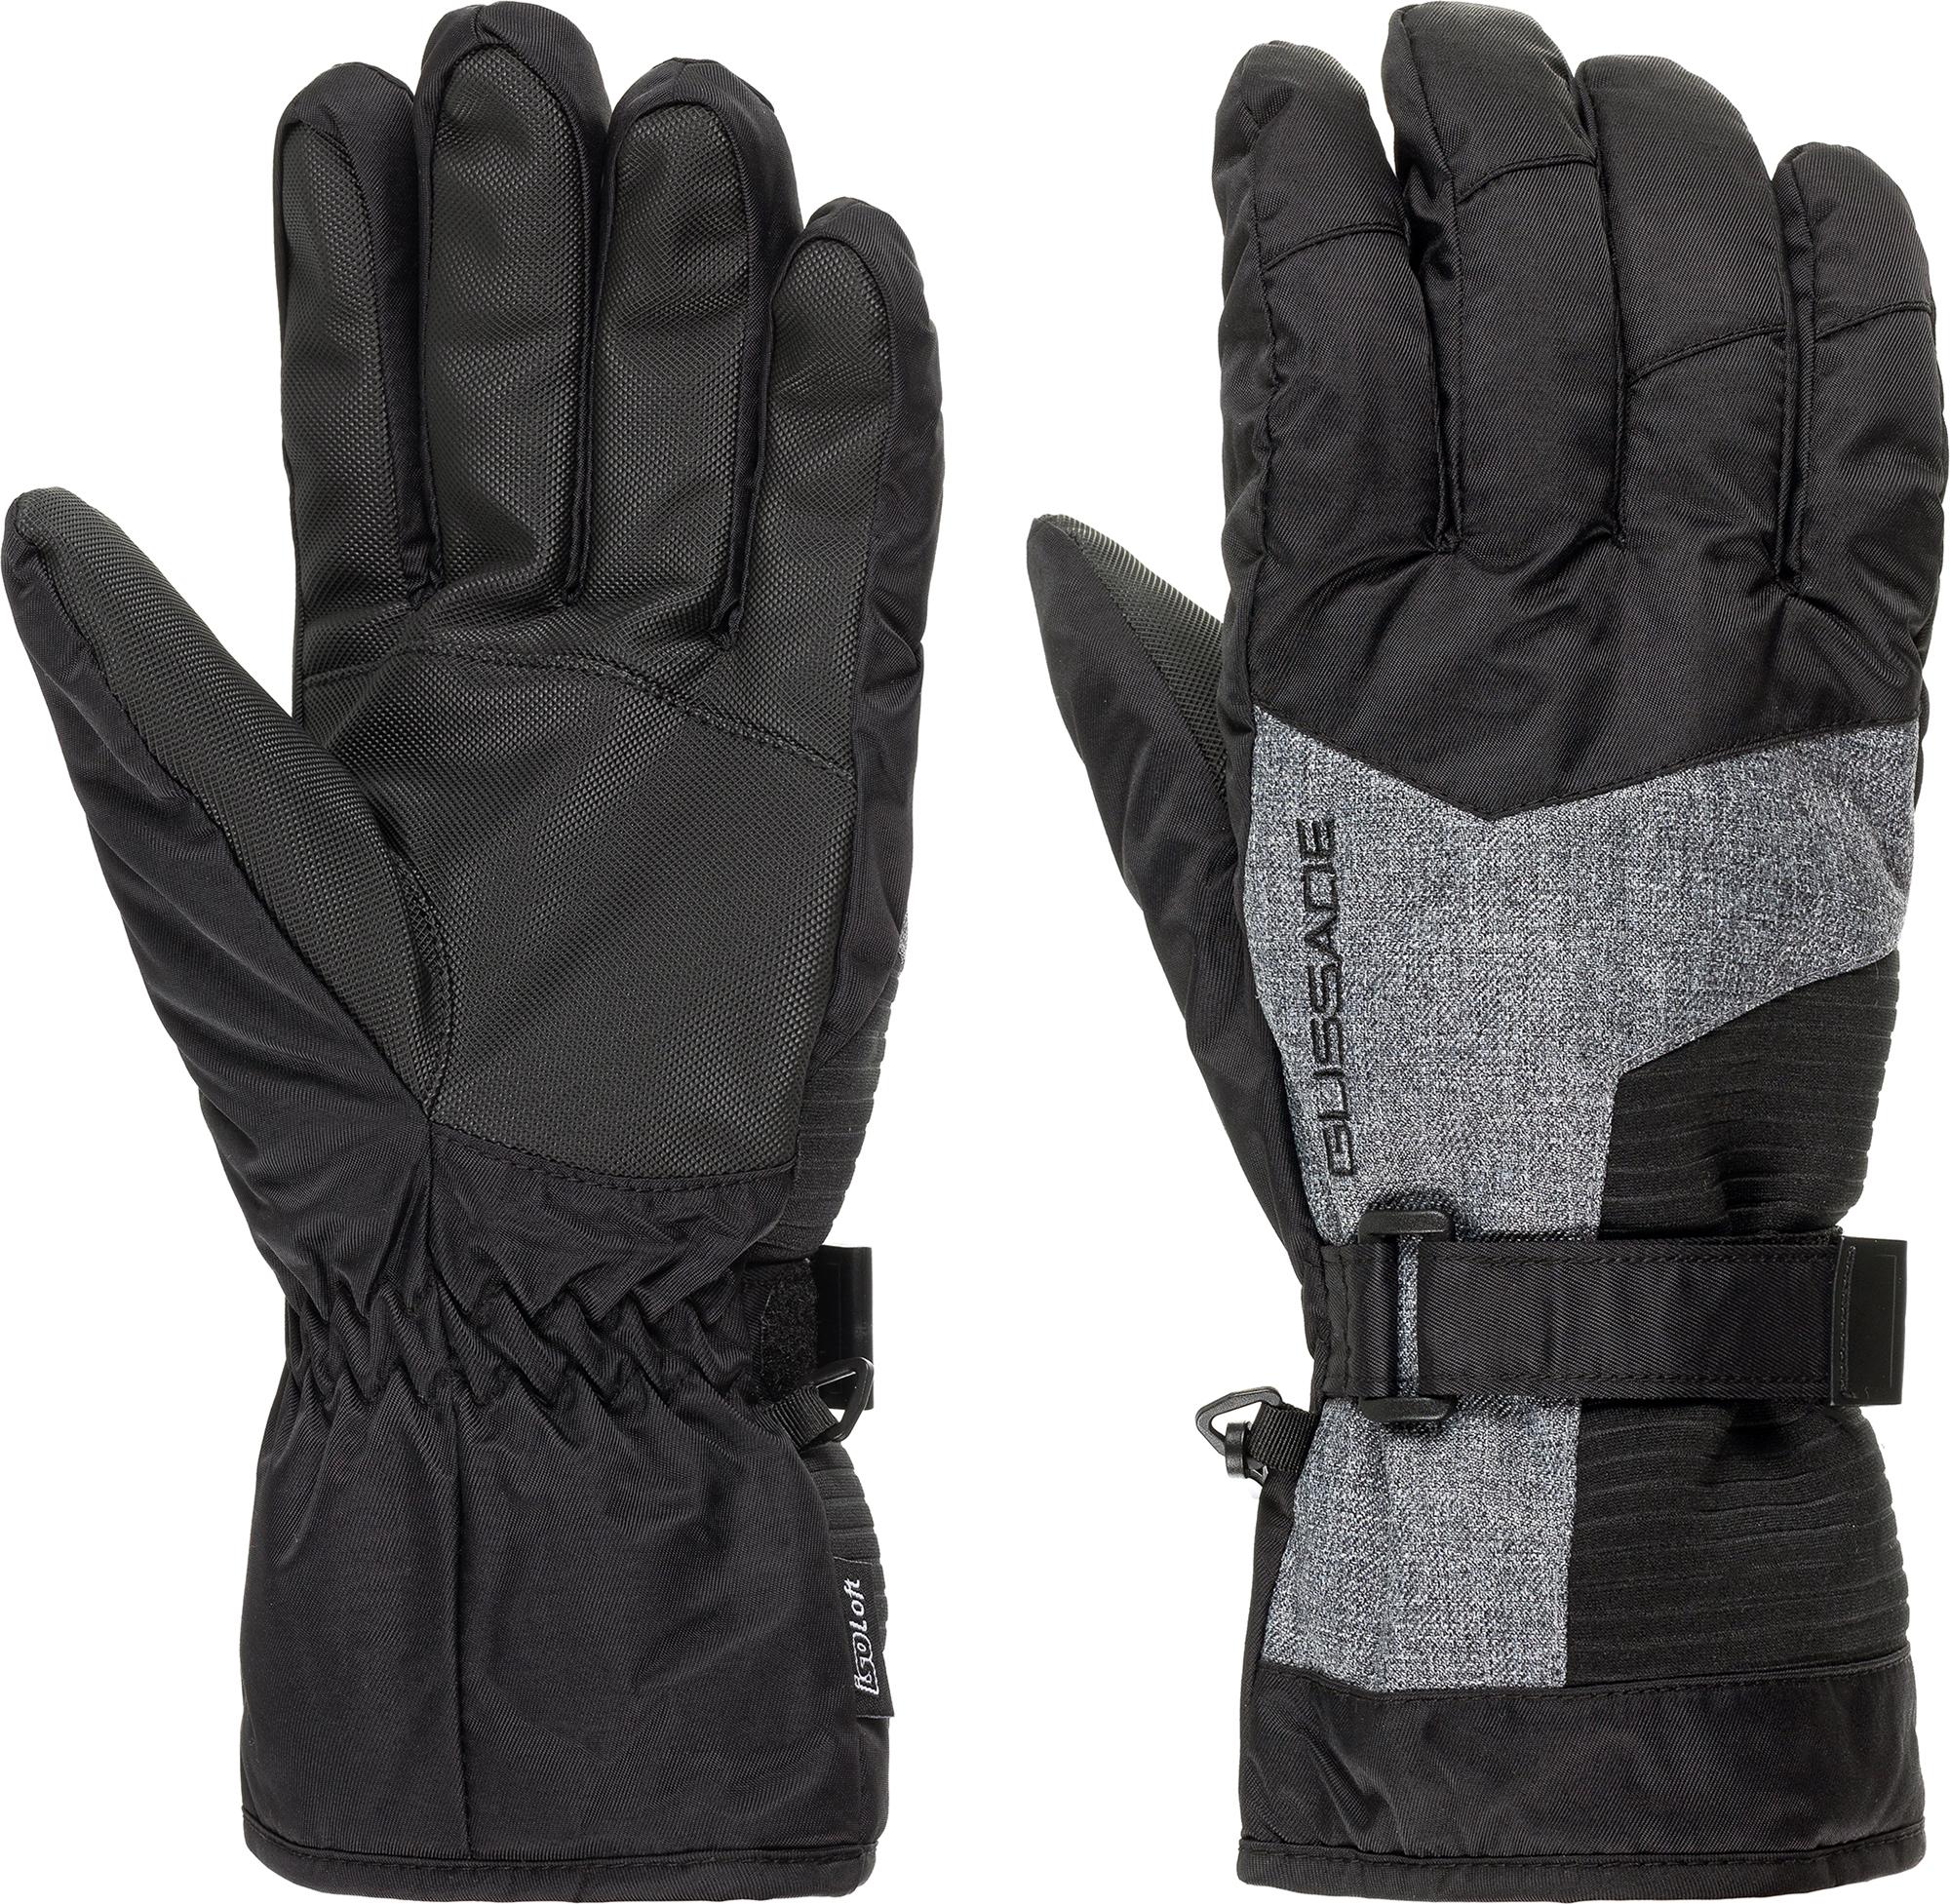 Glissade Перчатки мужские Glissade, размер 9 перчатки jetasafety jle021 9 l12